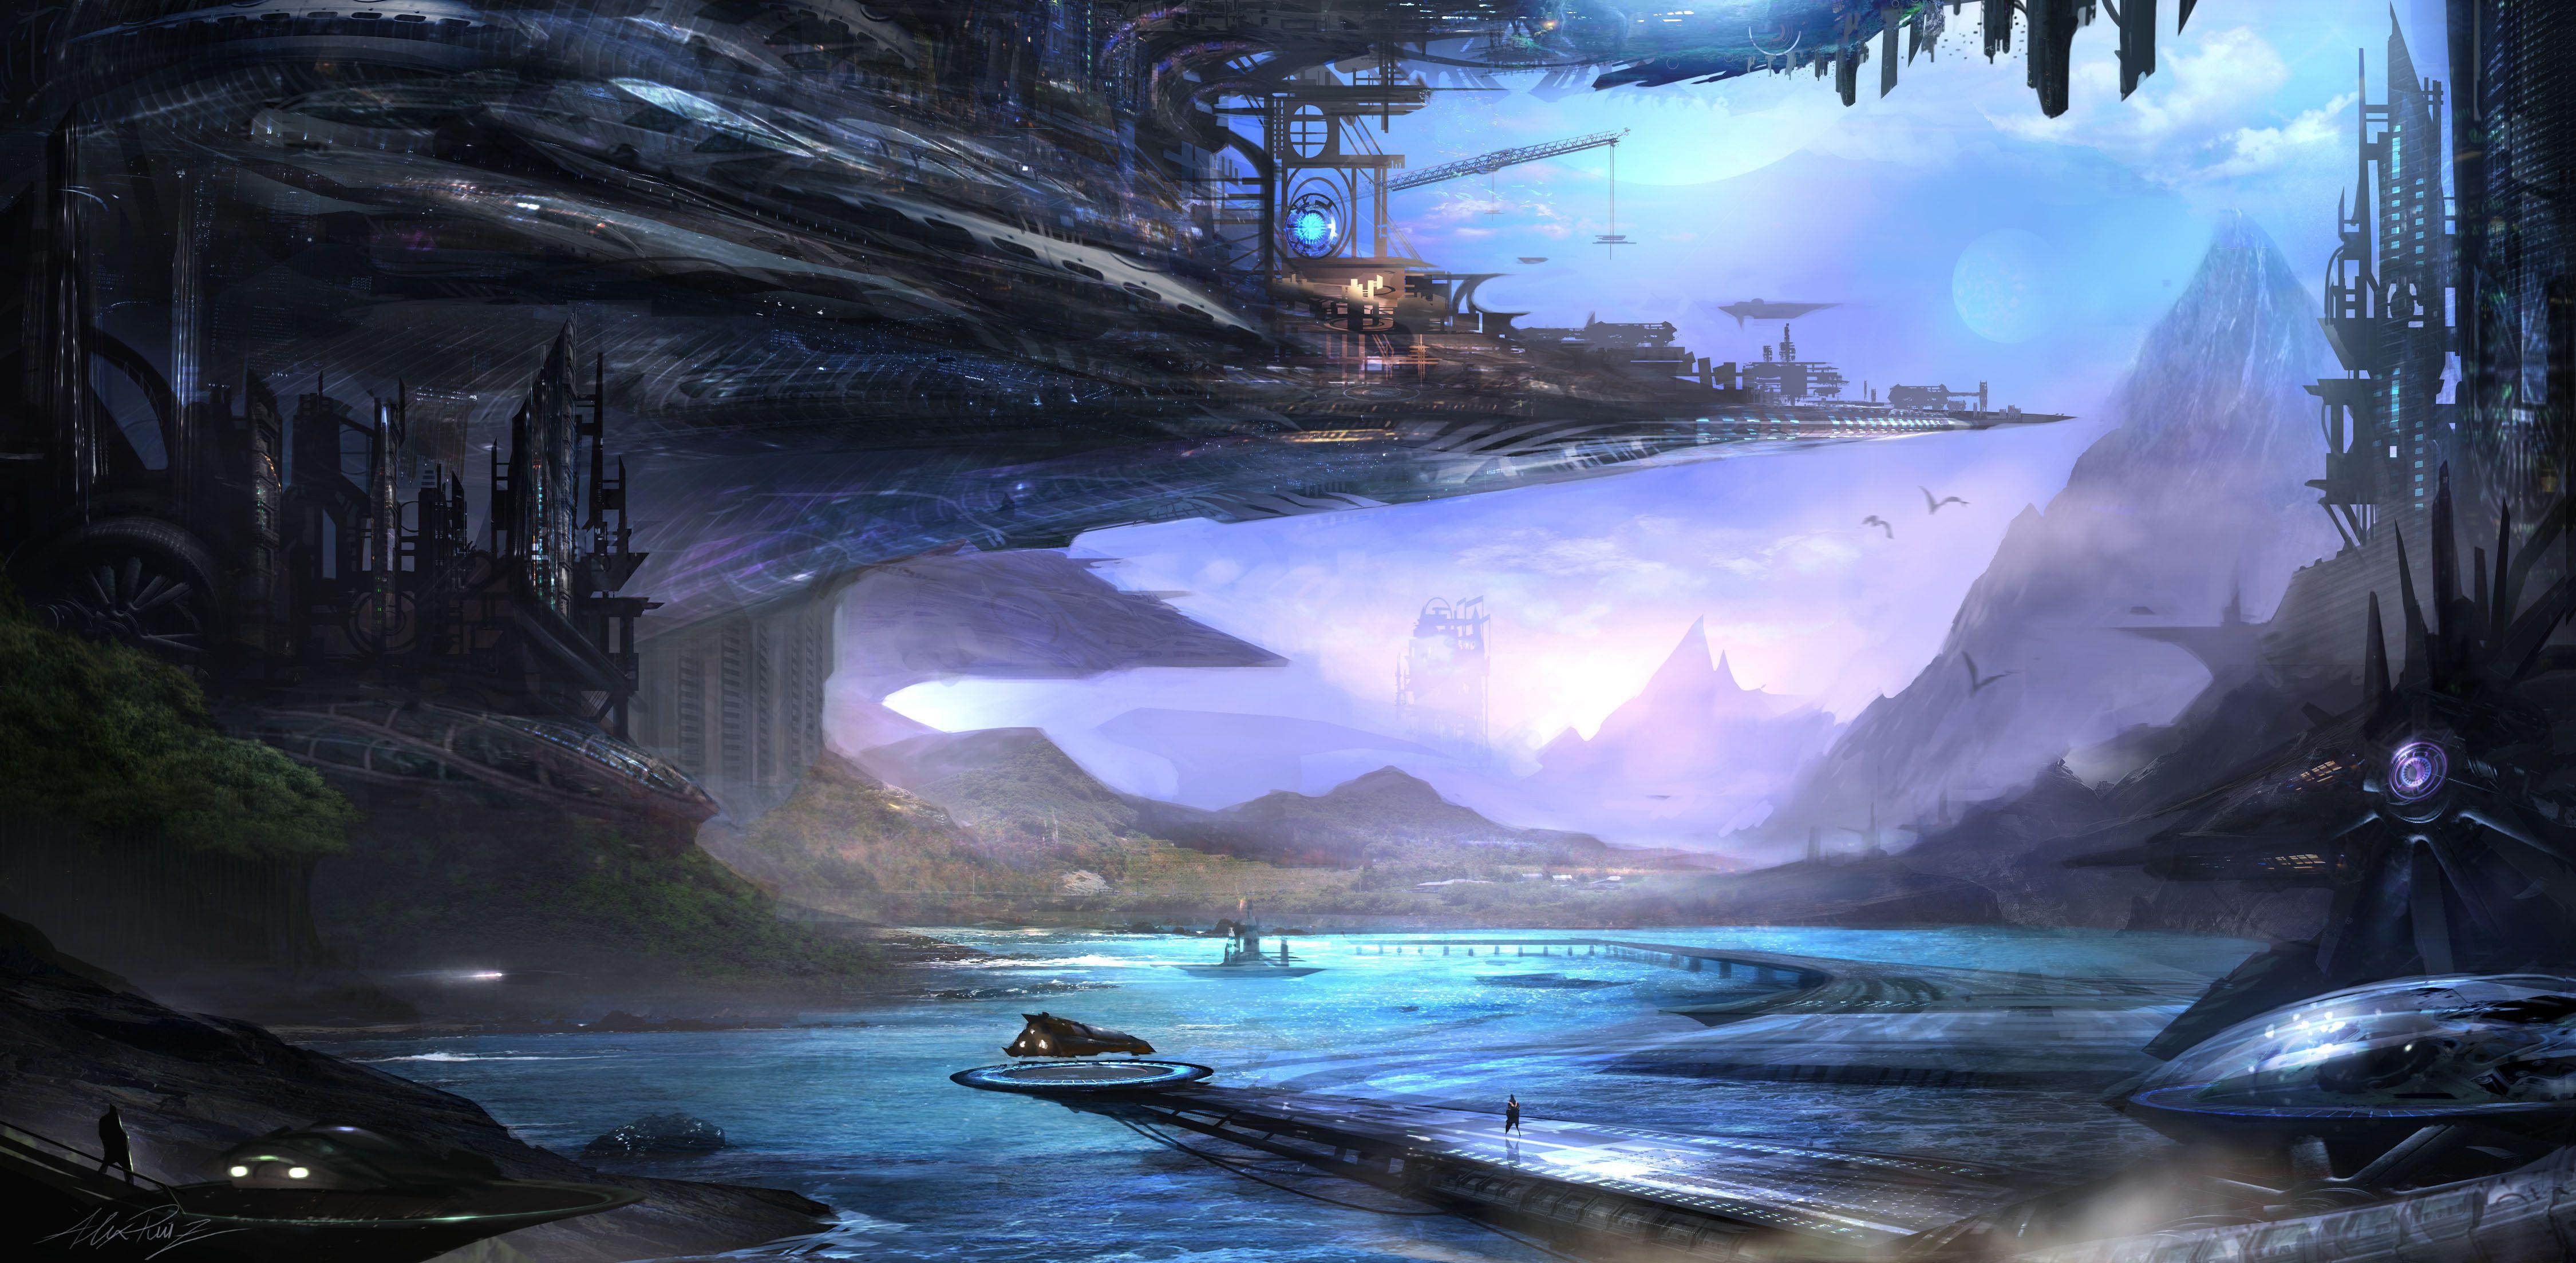 Sci Fi Landscape Wallpaper Anime Scenery Wallpaper Scenery Wallpaper Fantasy Landscape